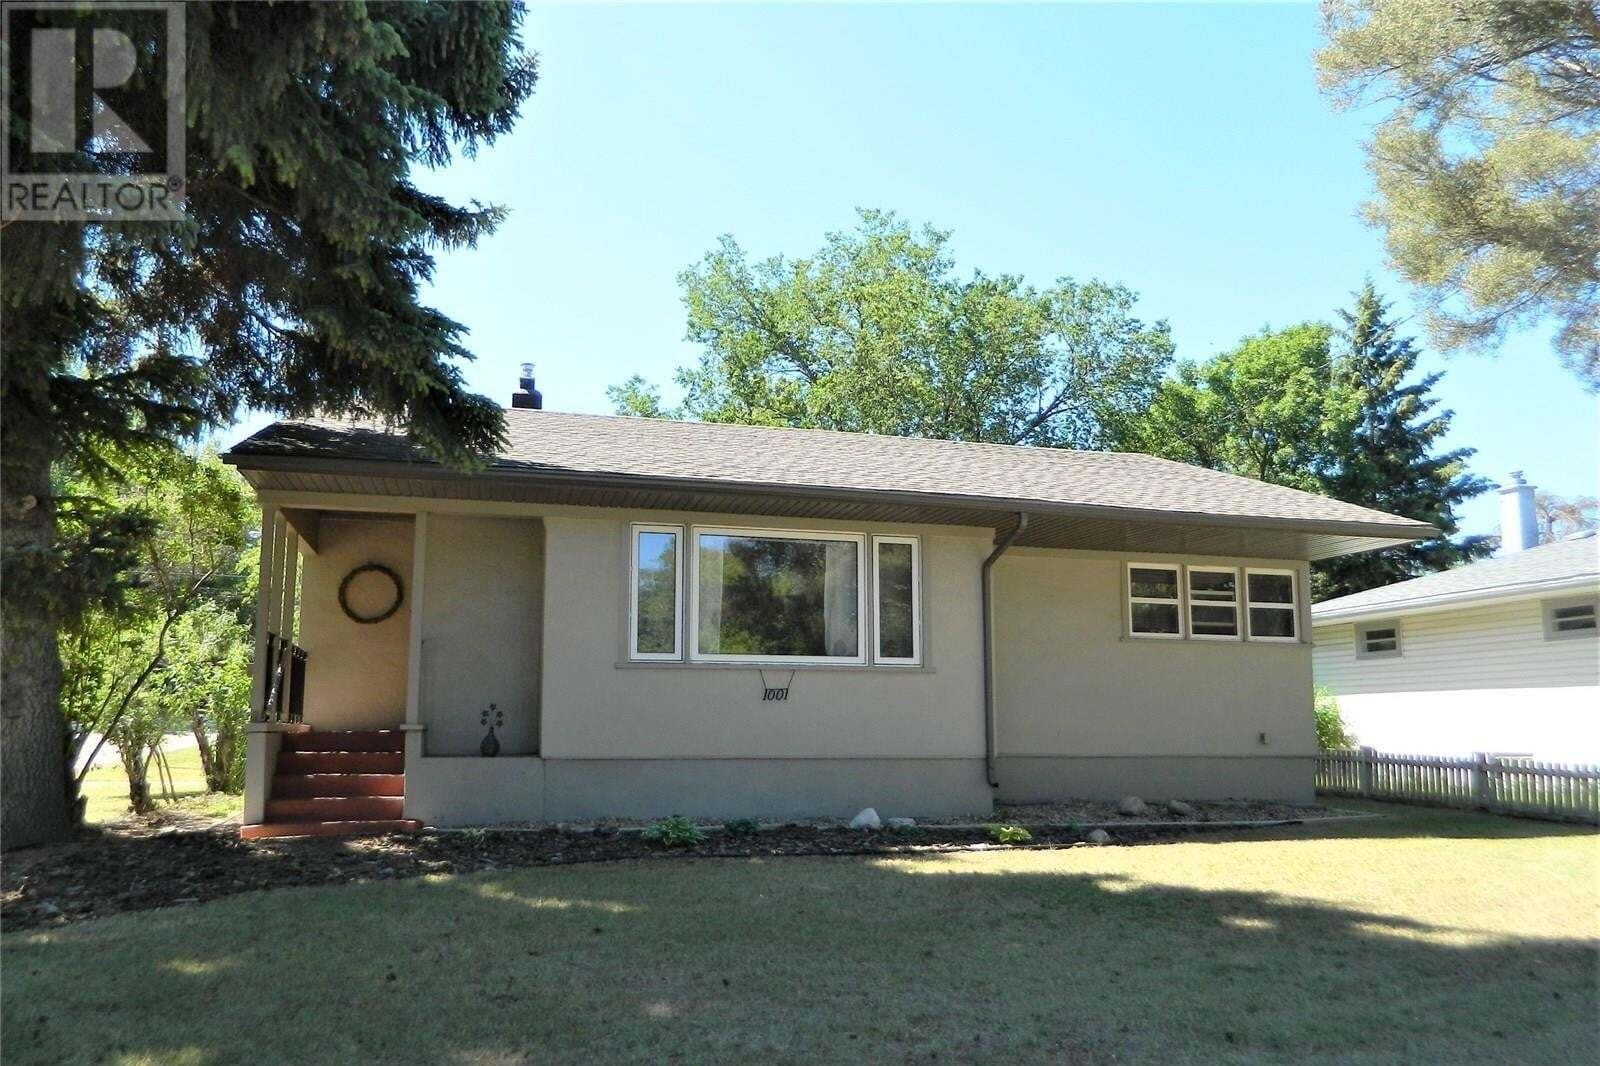 House for sale at 1001 Coteau St W Moose Jaw Saskatchewan - MLS: SK813964